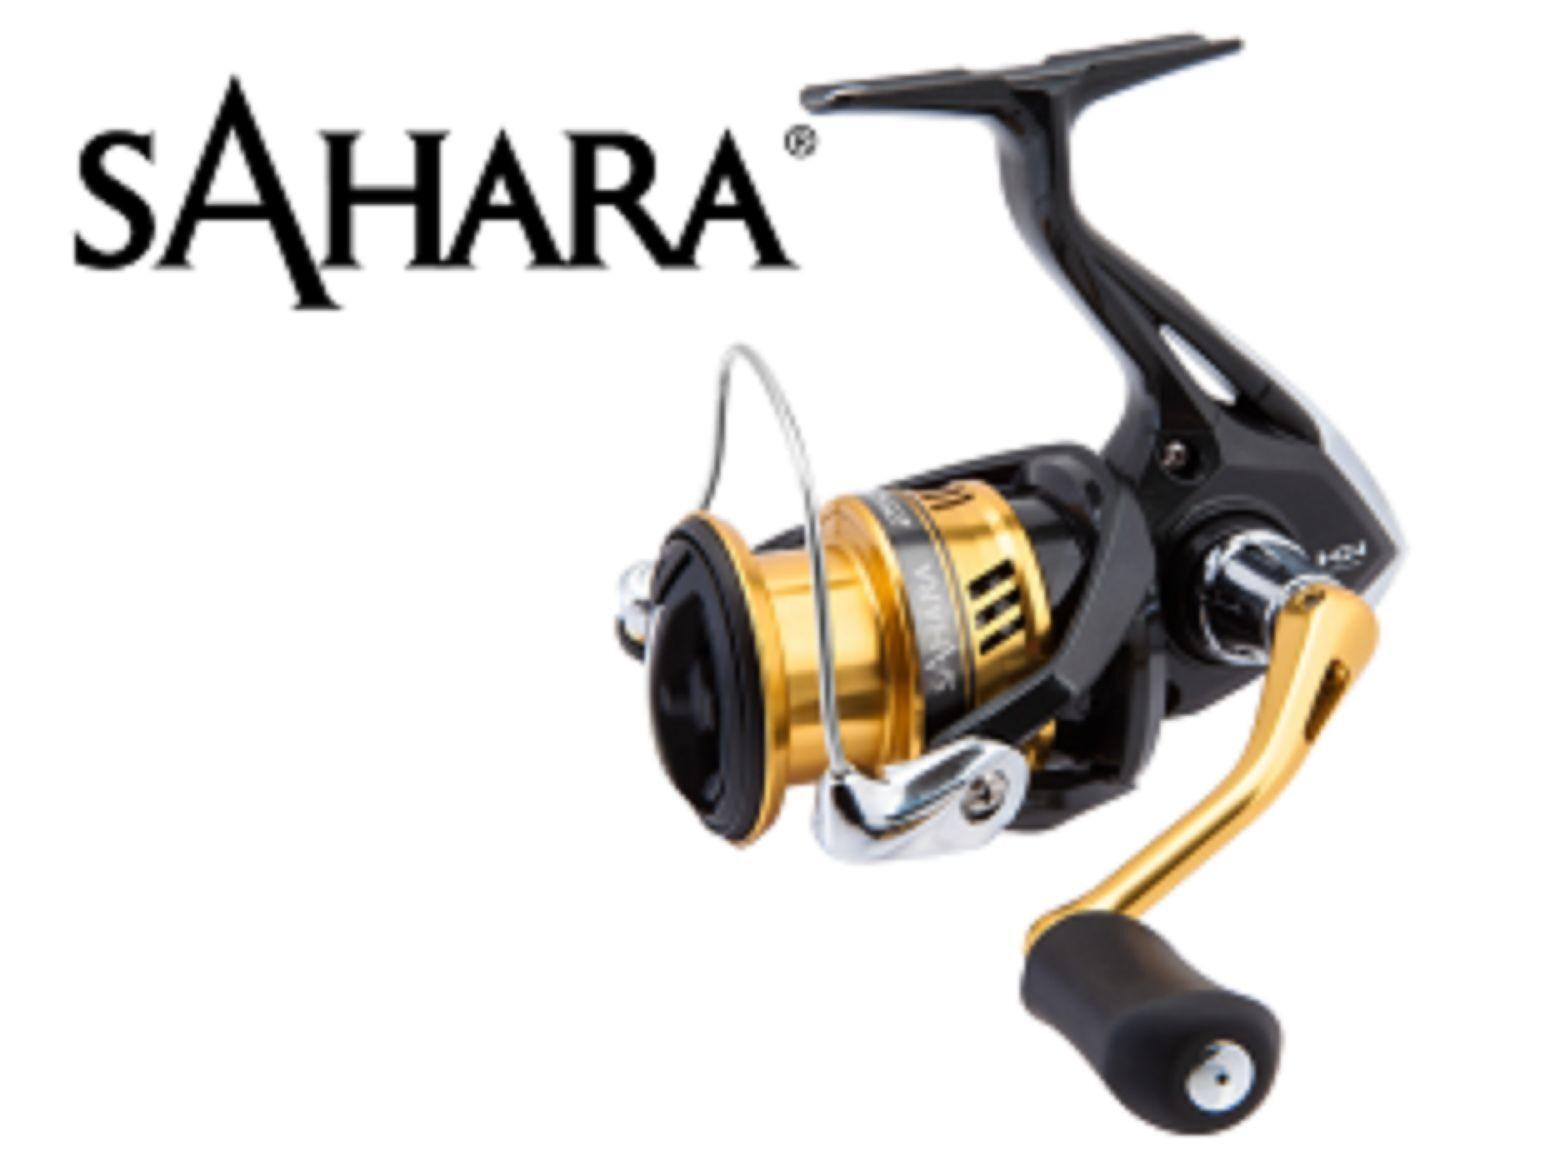 NEW Shimano Sahara 2500 Spinning Reel, Front Drag, 1RB 4BB + 1RB Drag, , 5.0:1 SH2500FI 32b1b1